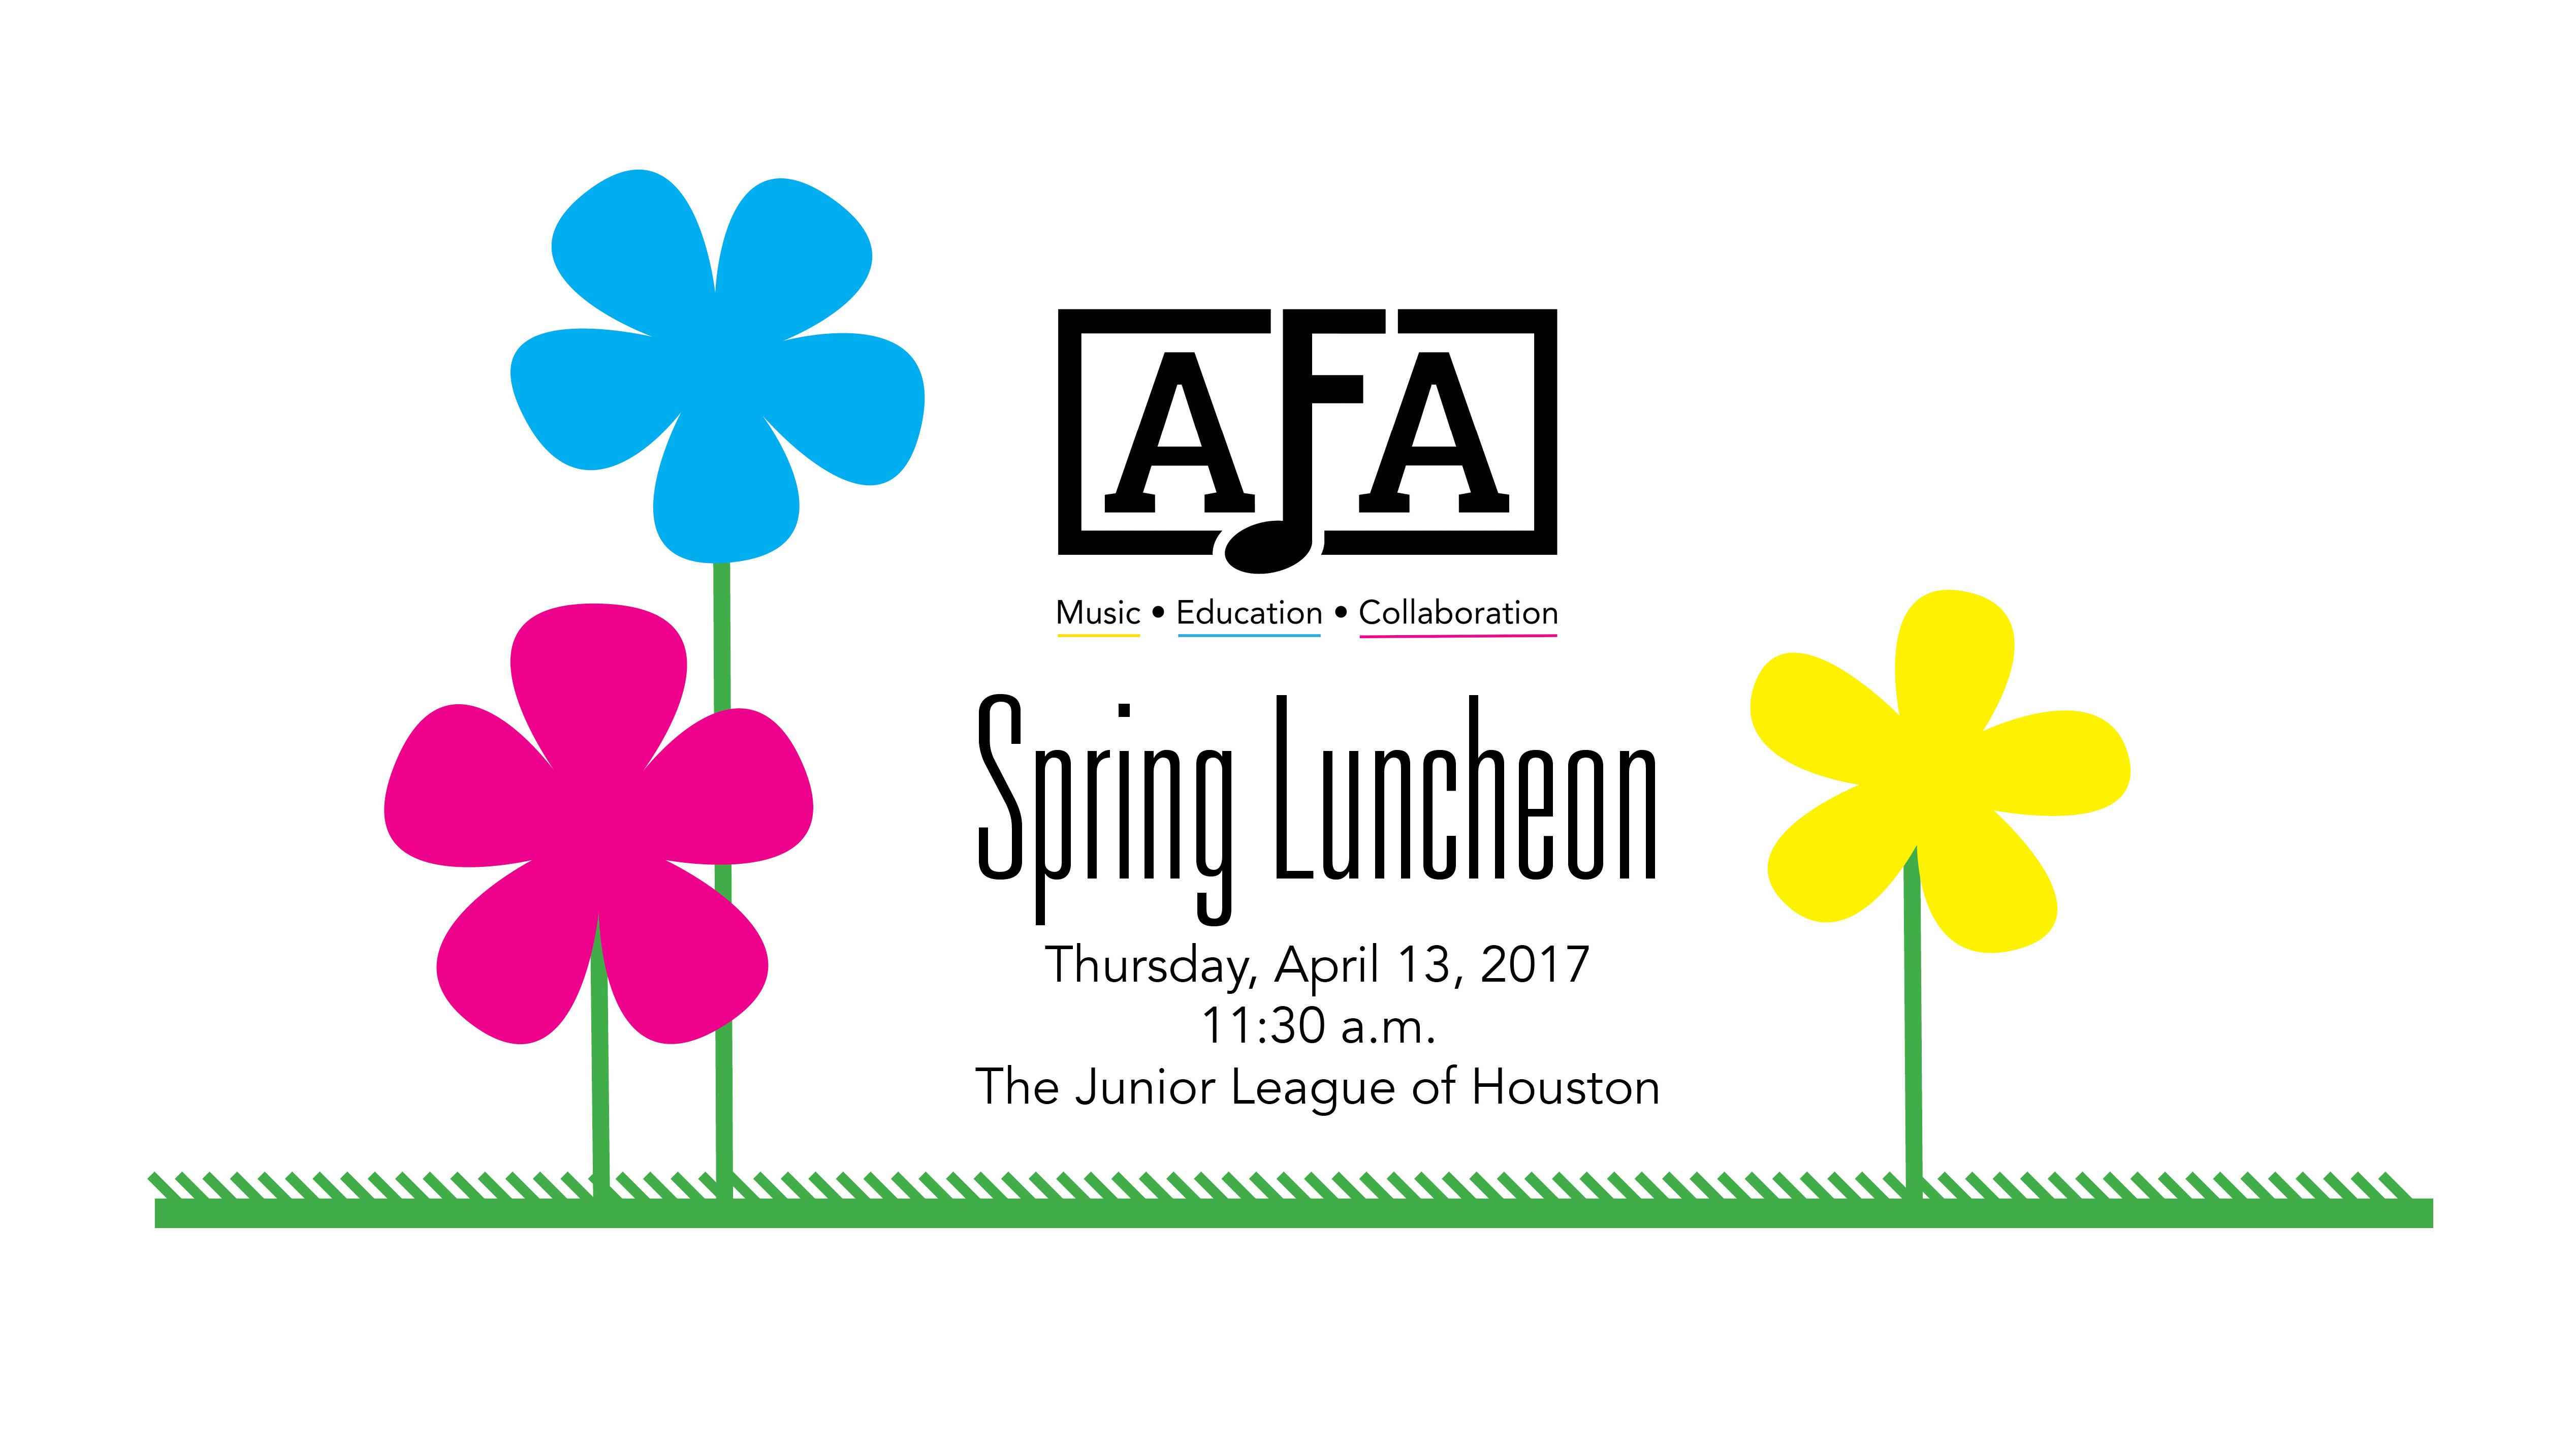 AFA Spring Luncheon